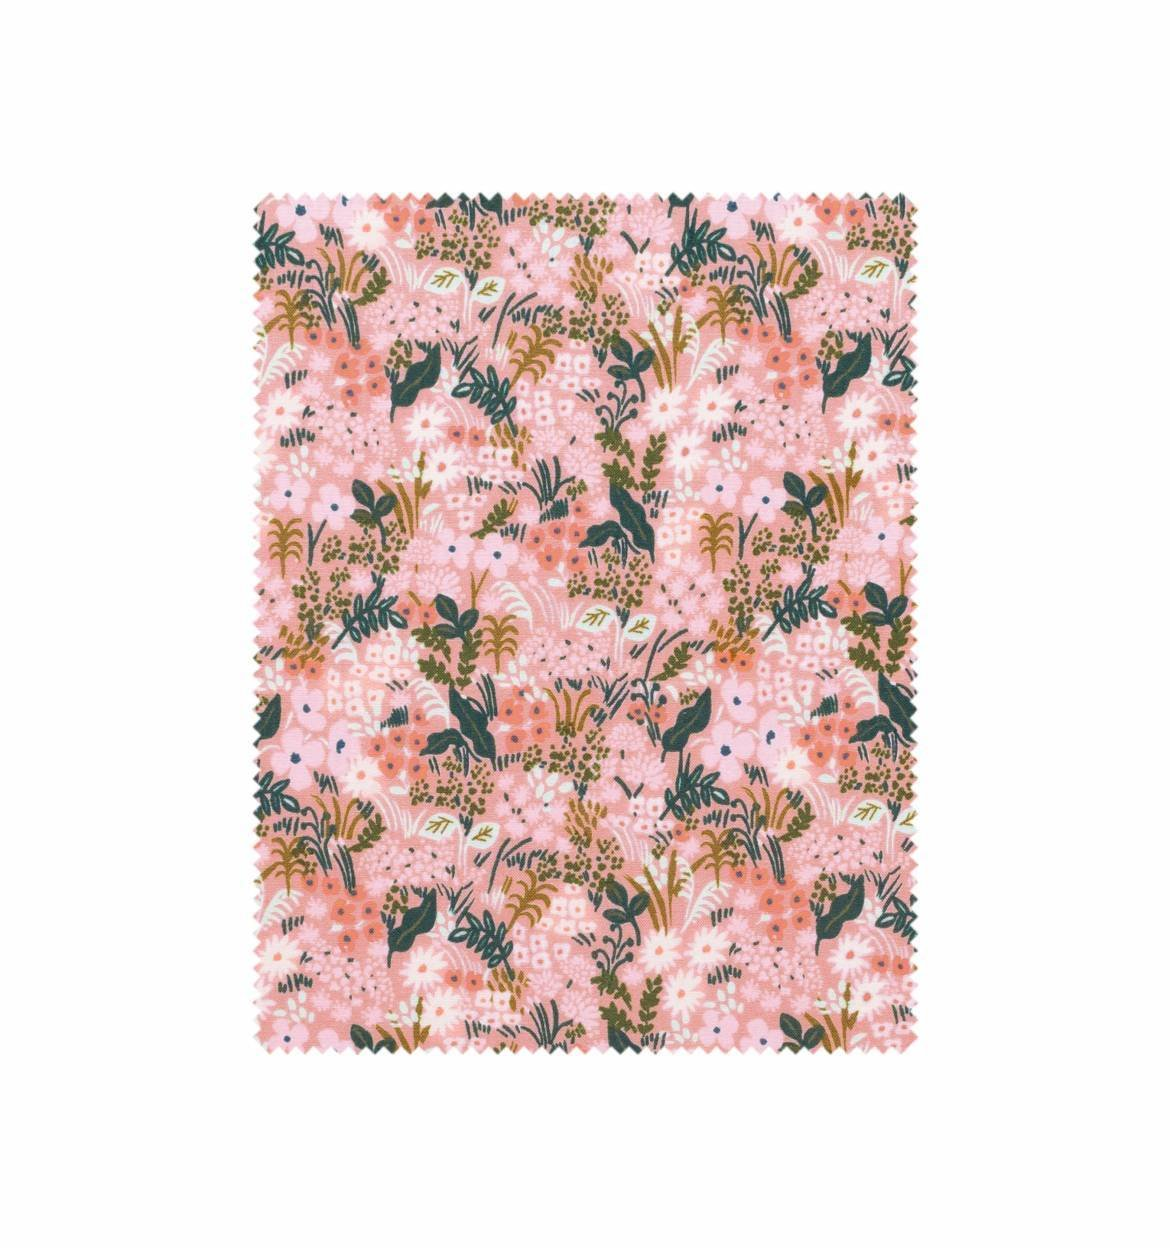 English Garden - Meadow - Pink - AB8059-002